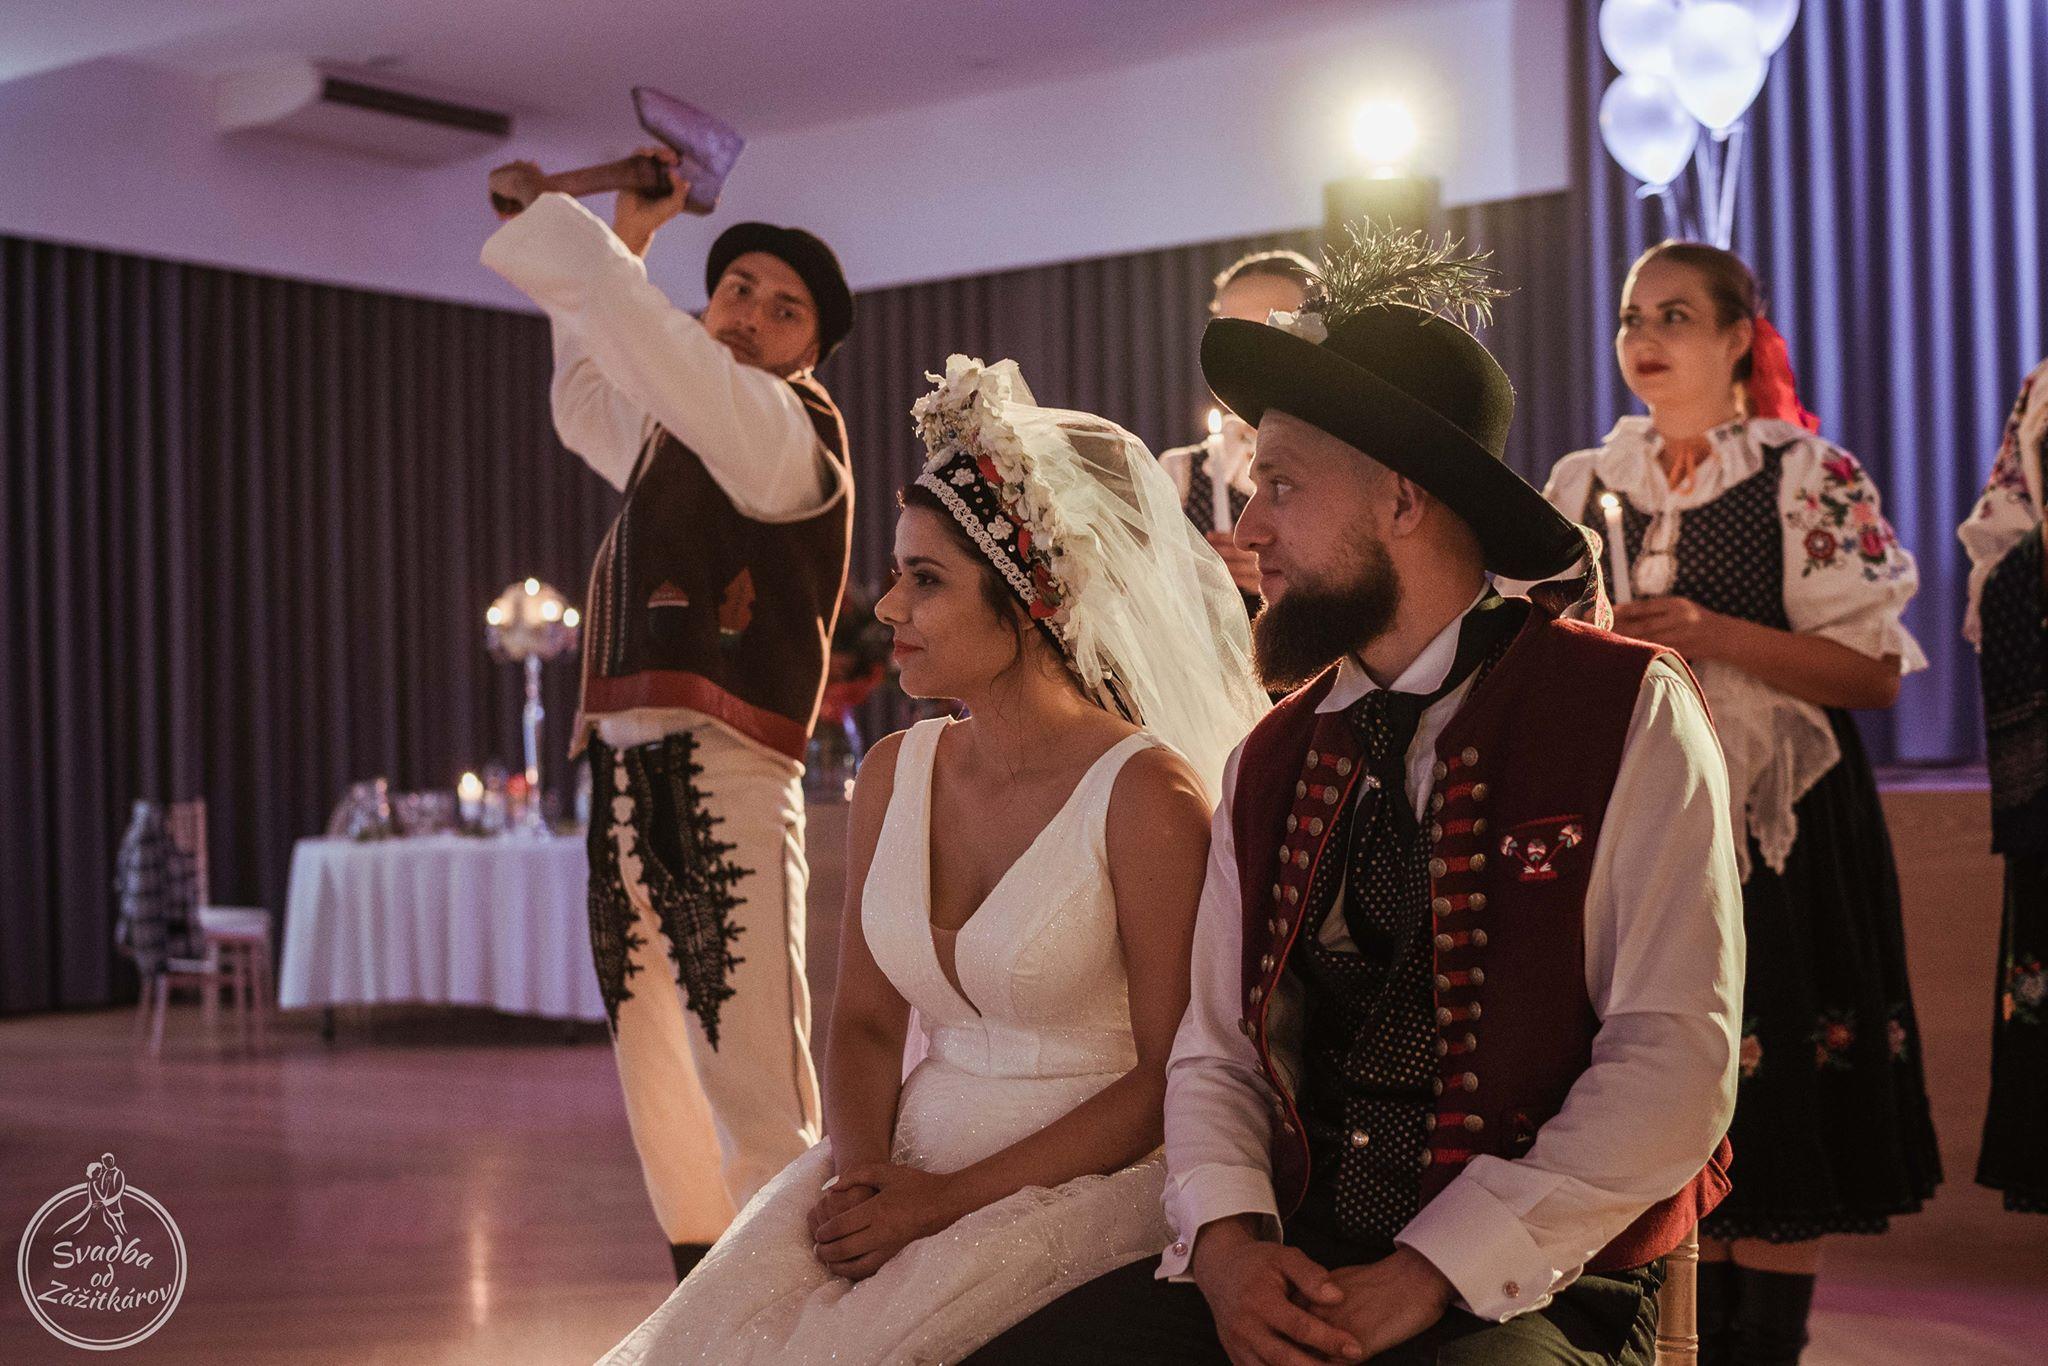 cepcenie-nevesty-svadba-wedding-tradition-slovakiajpg